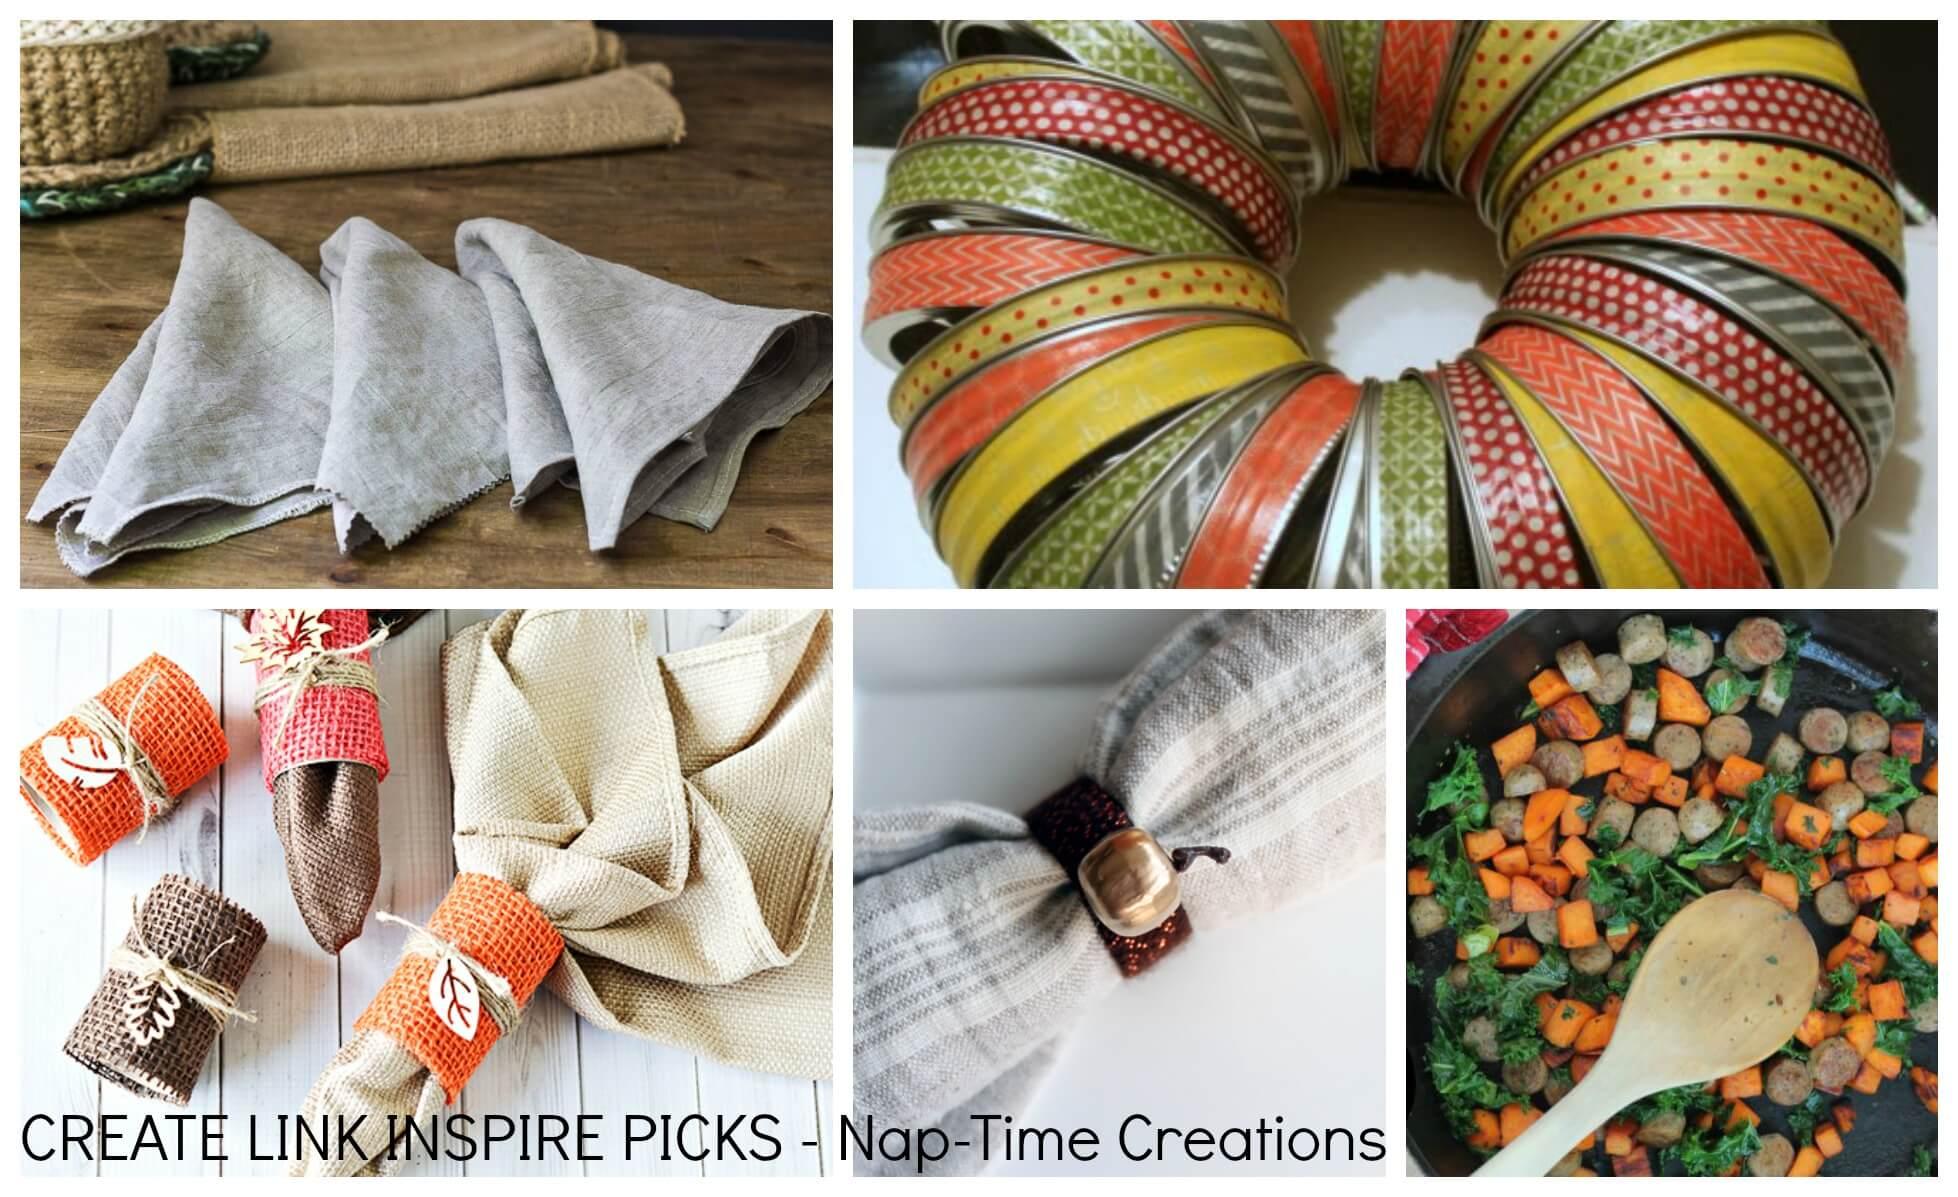 create-link-inspire-picks